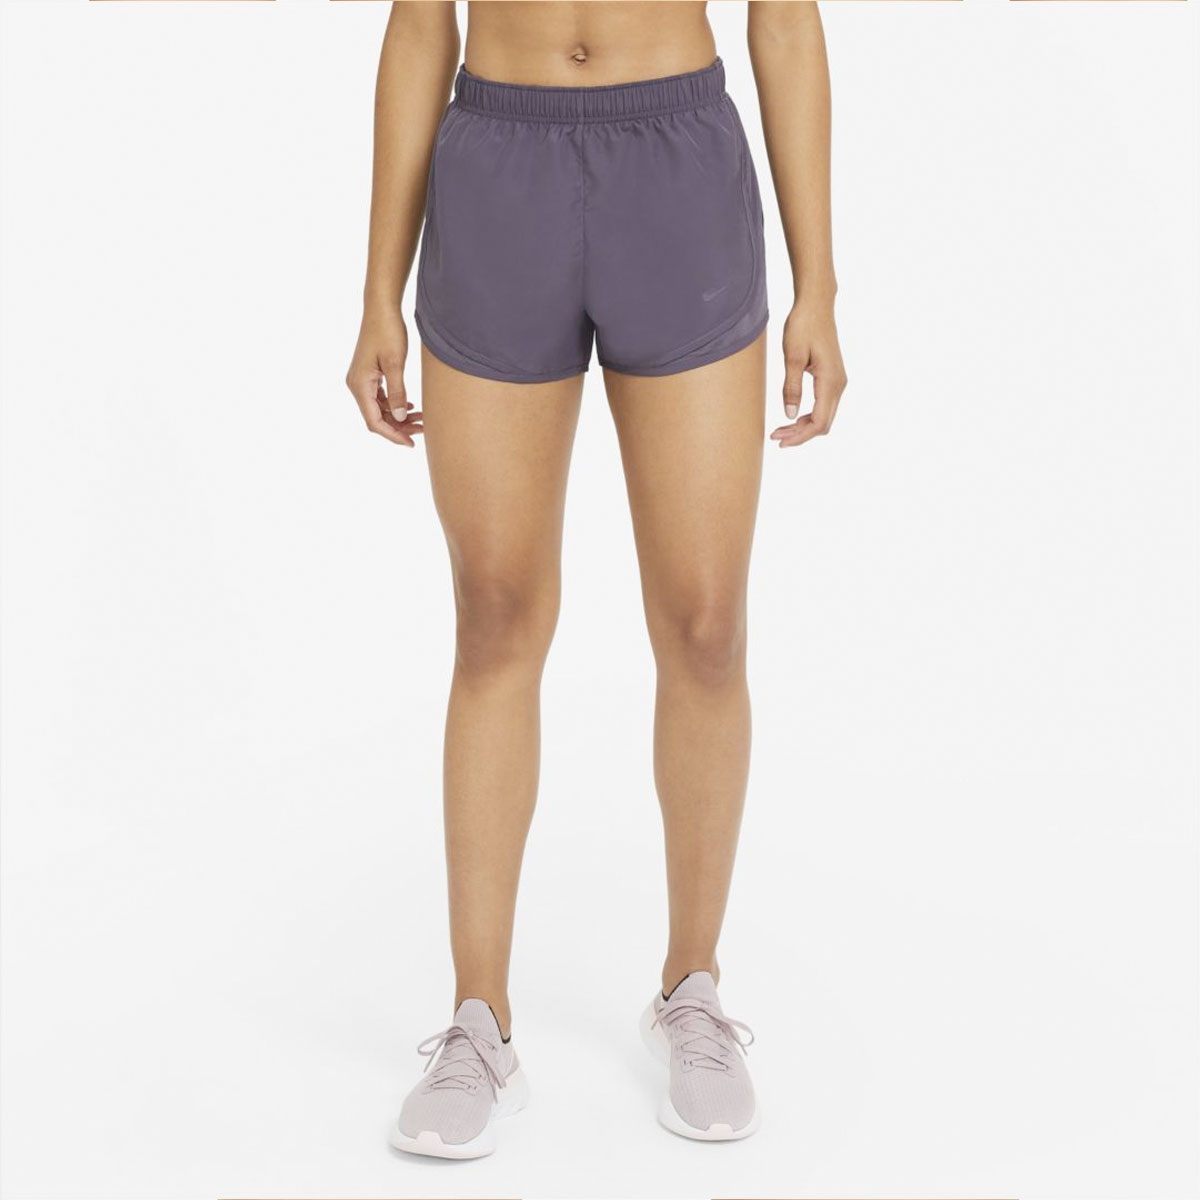 Women's Tempo Shorts, Purple, swatch